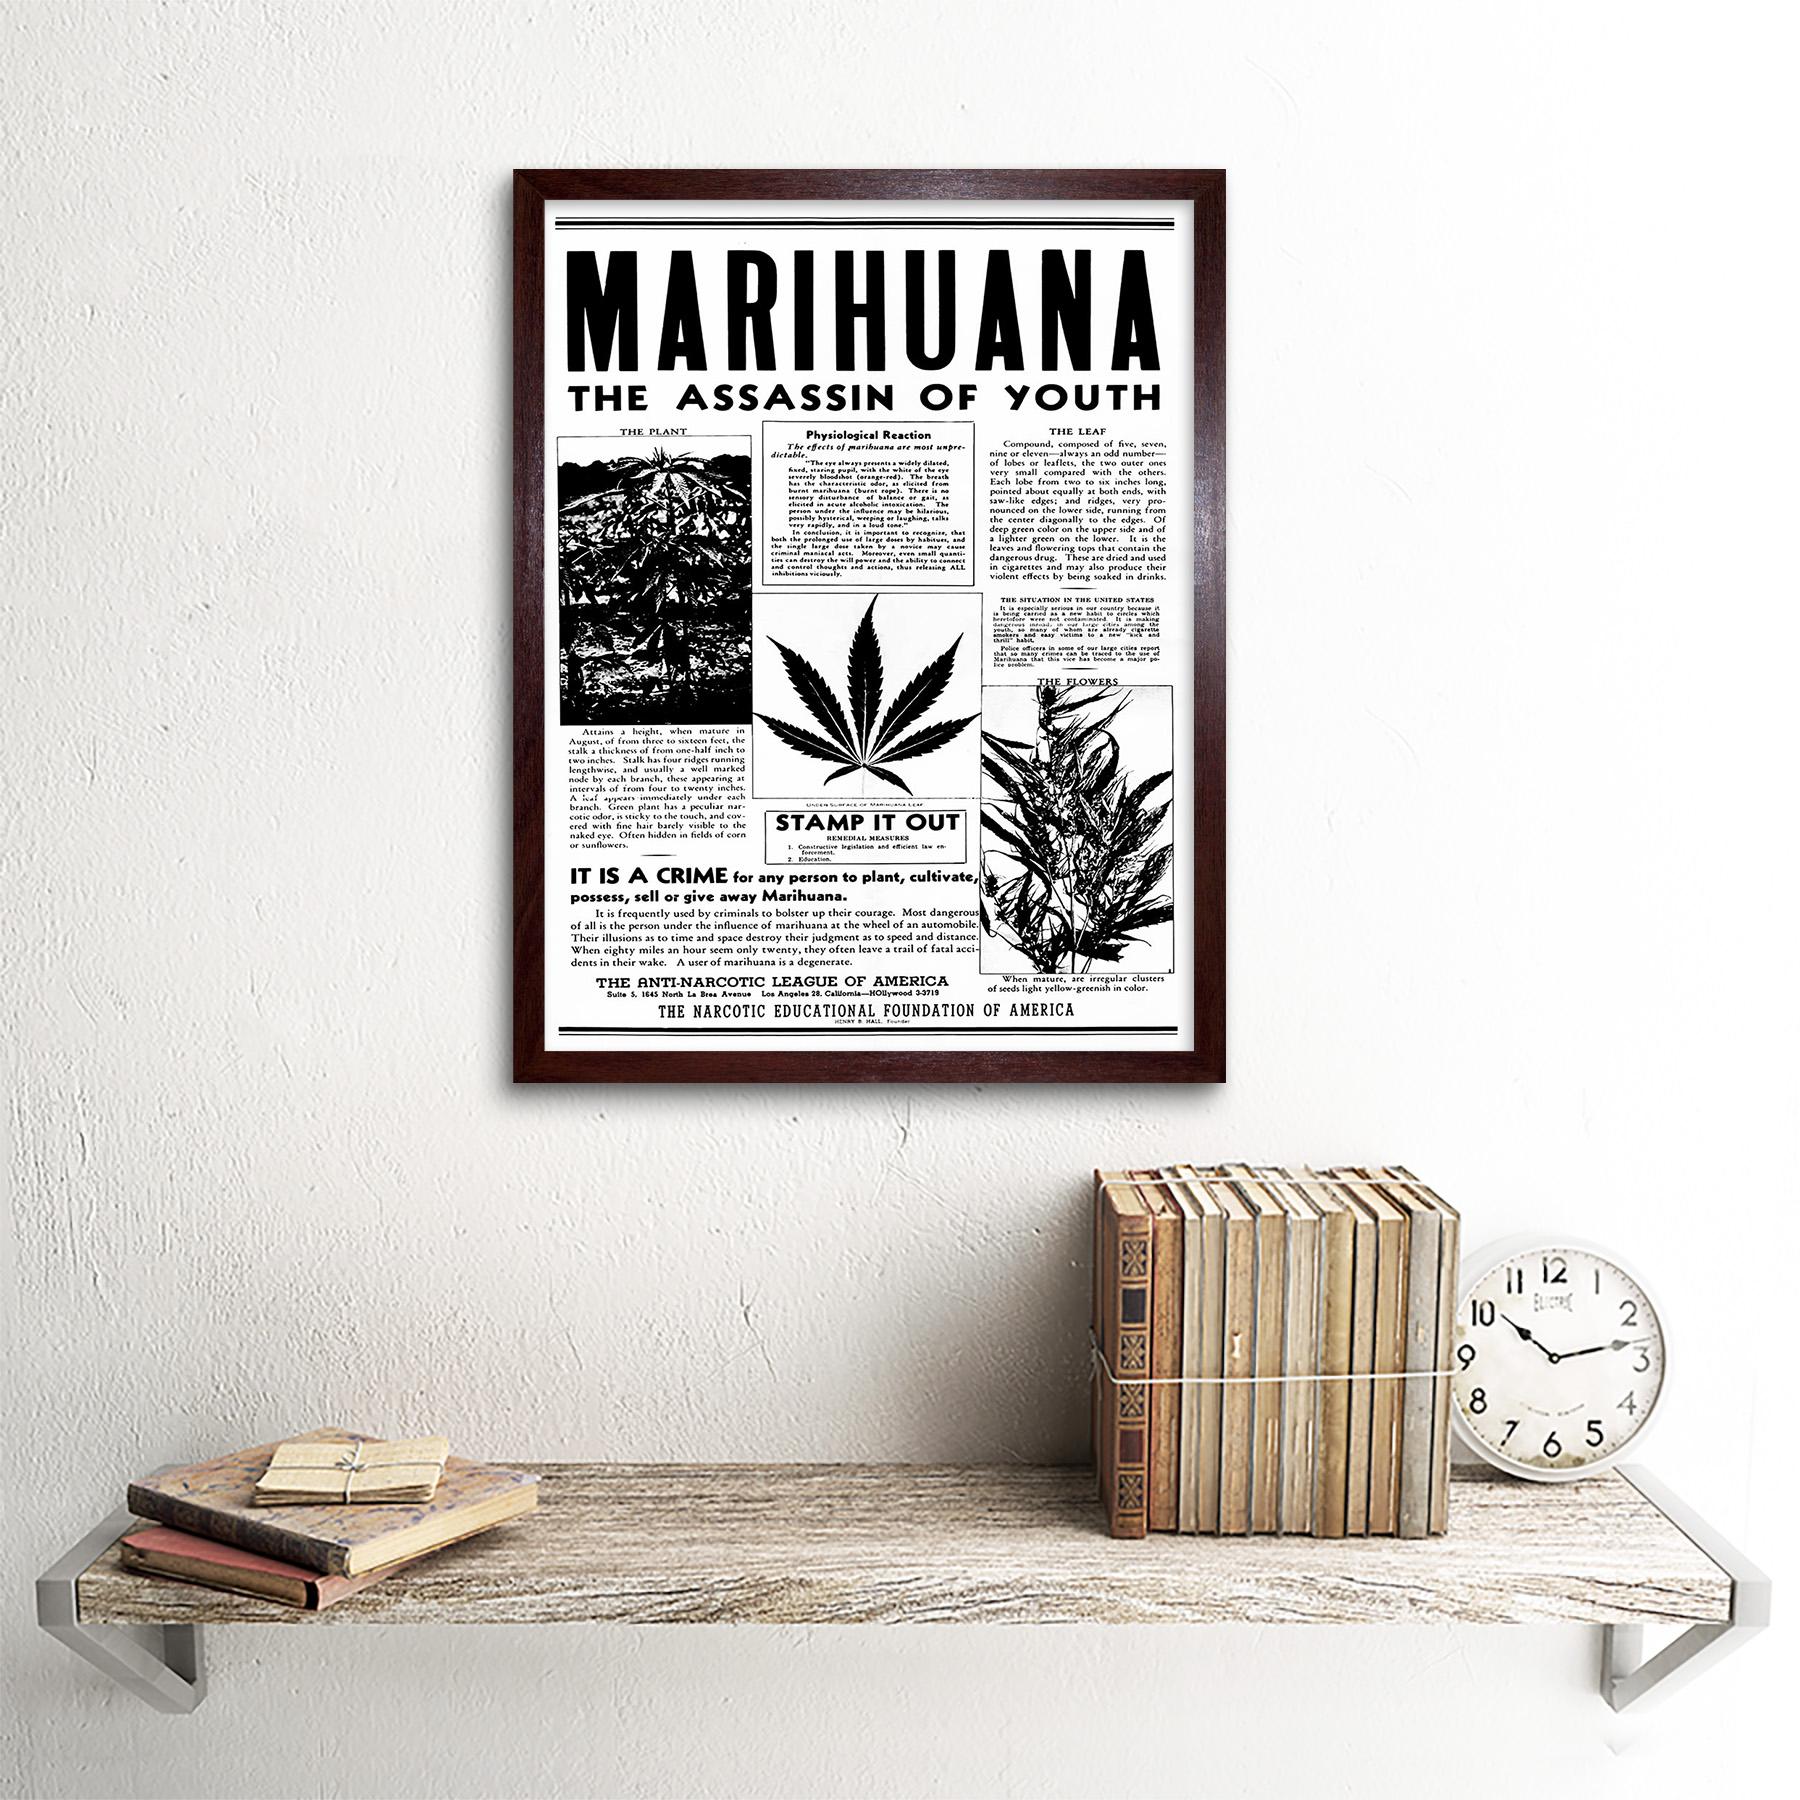 Паника конопля сколько времени света марихуане